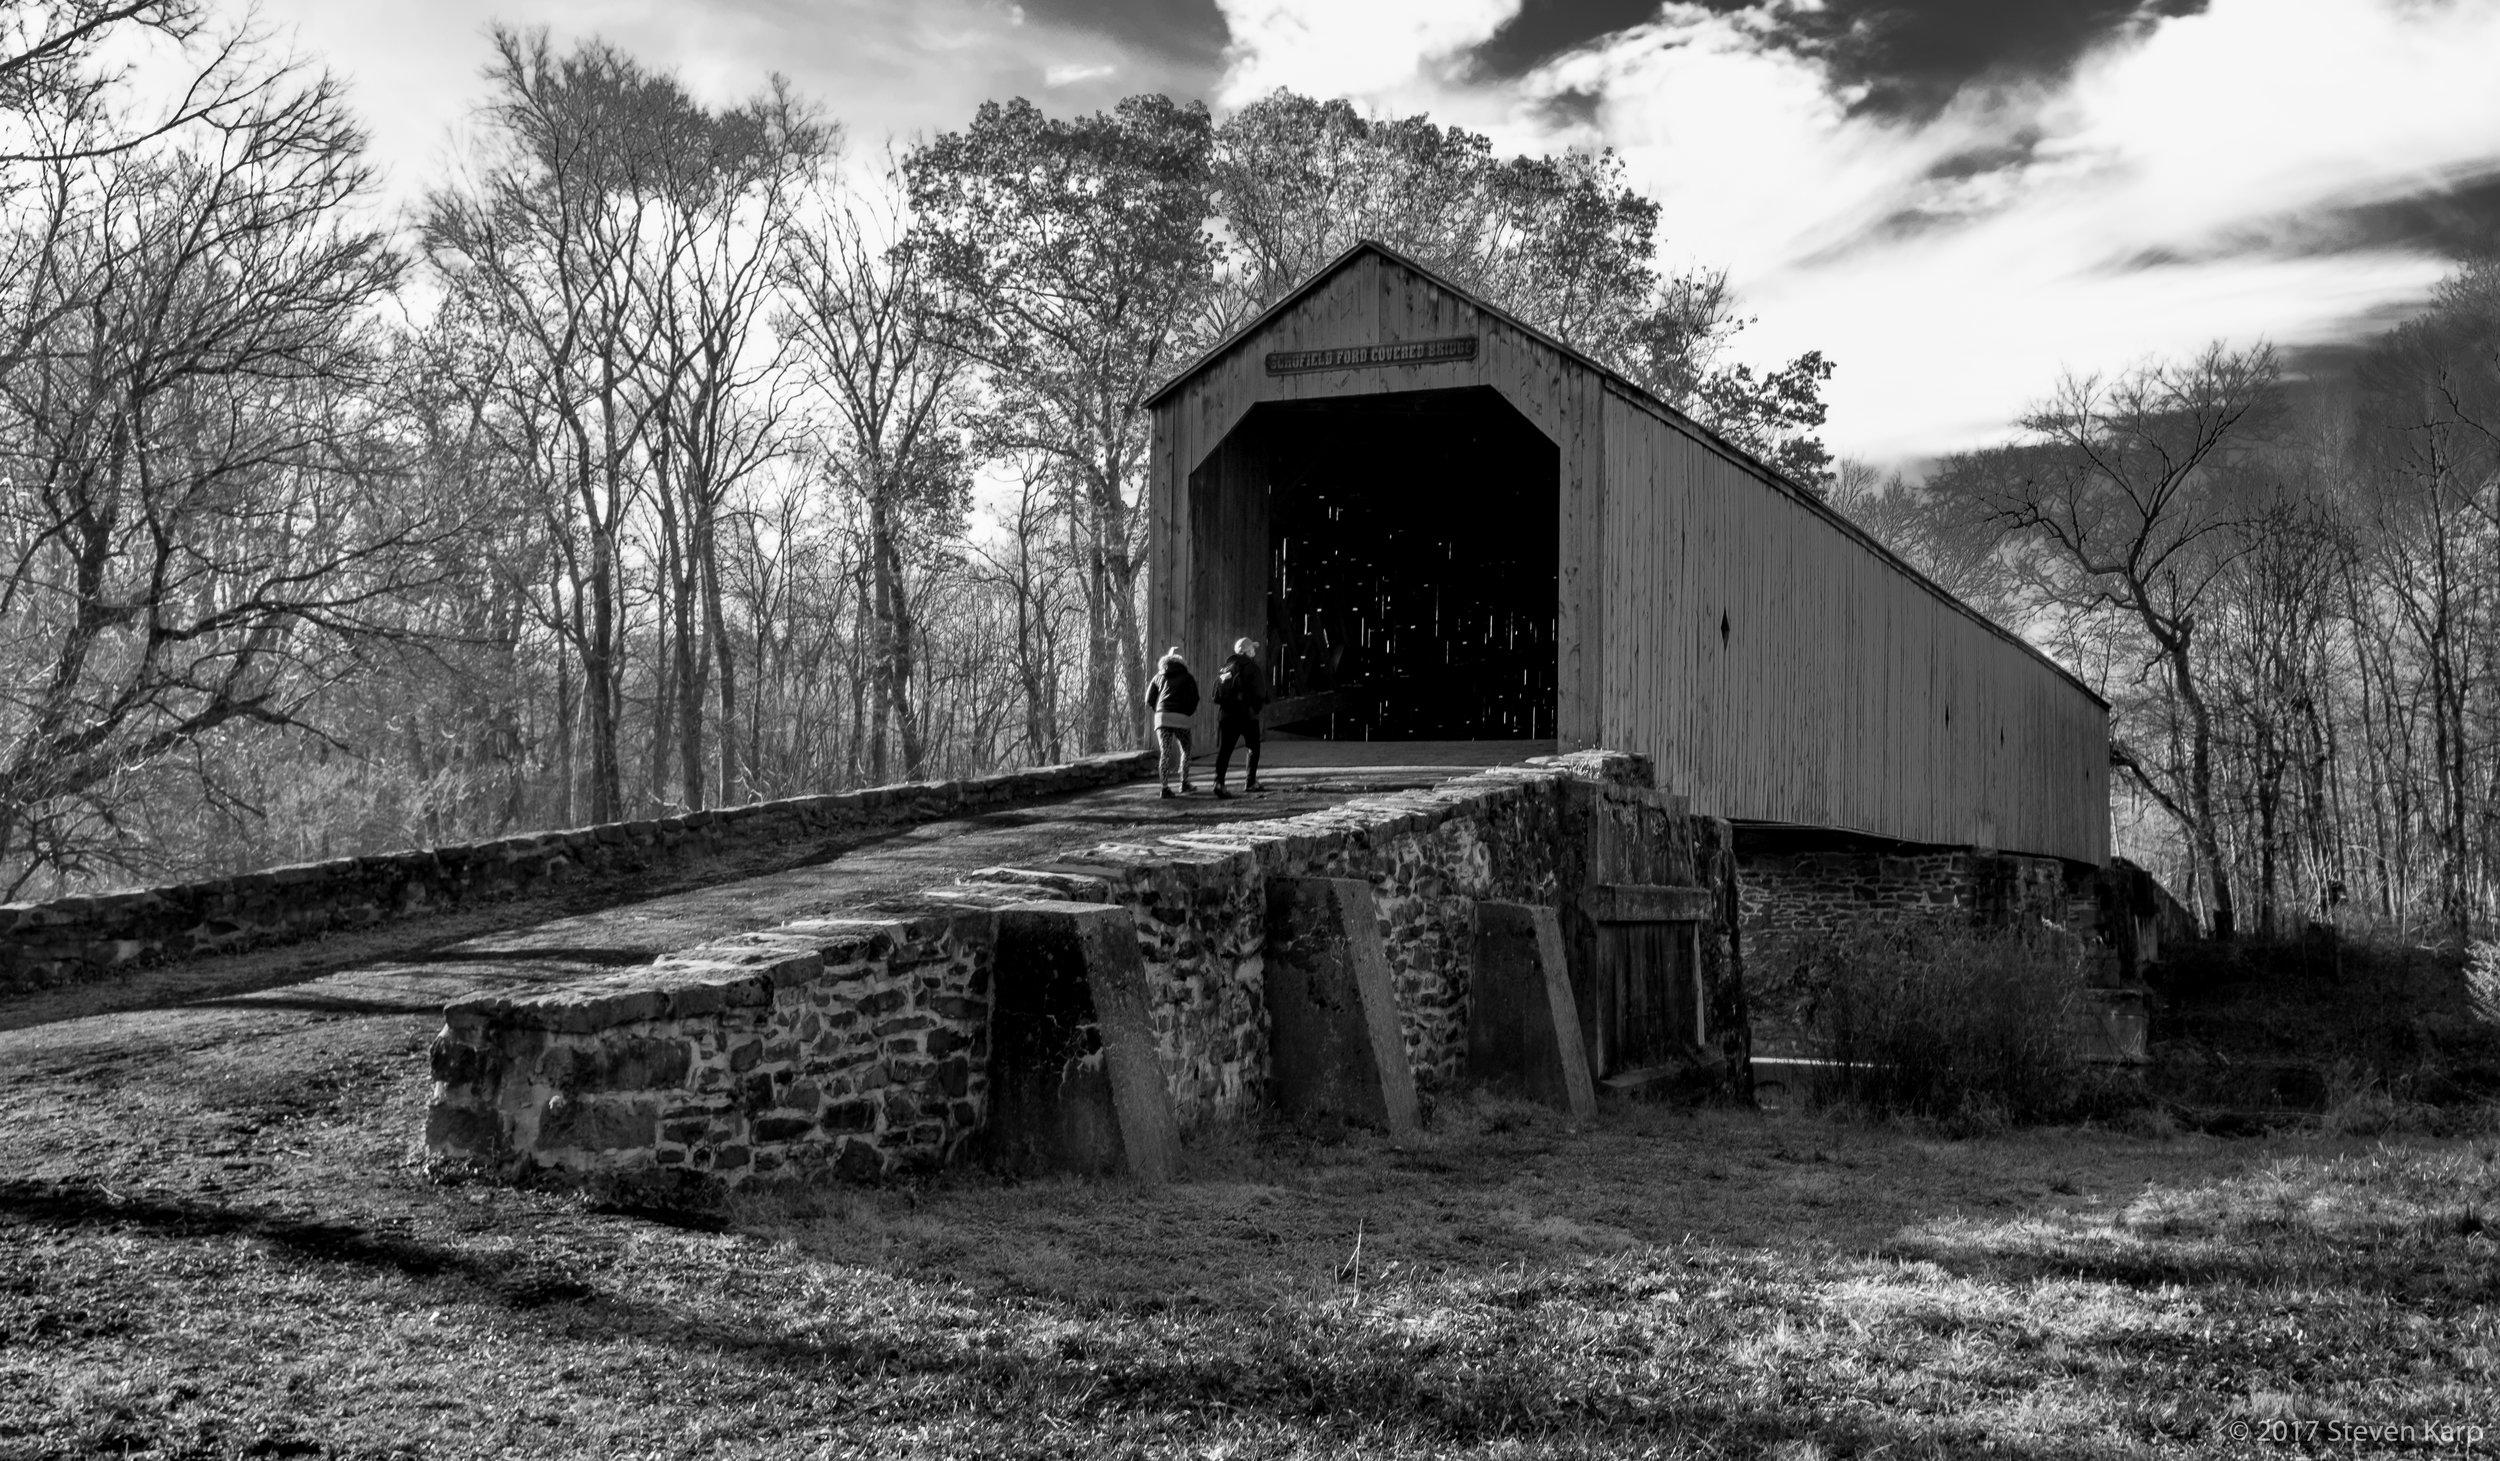 Schofield Ford Covered Bridge